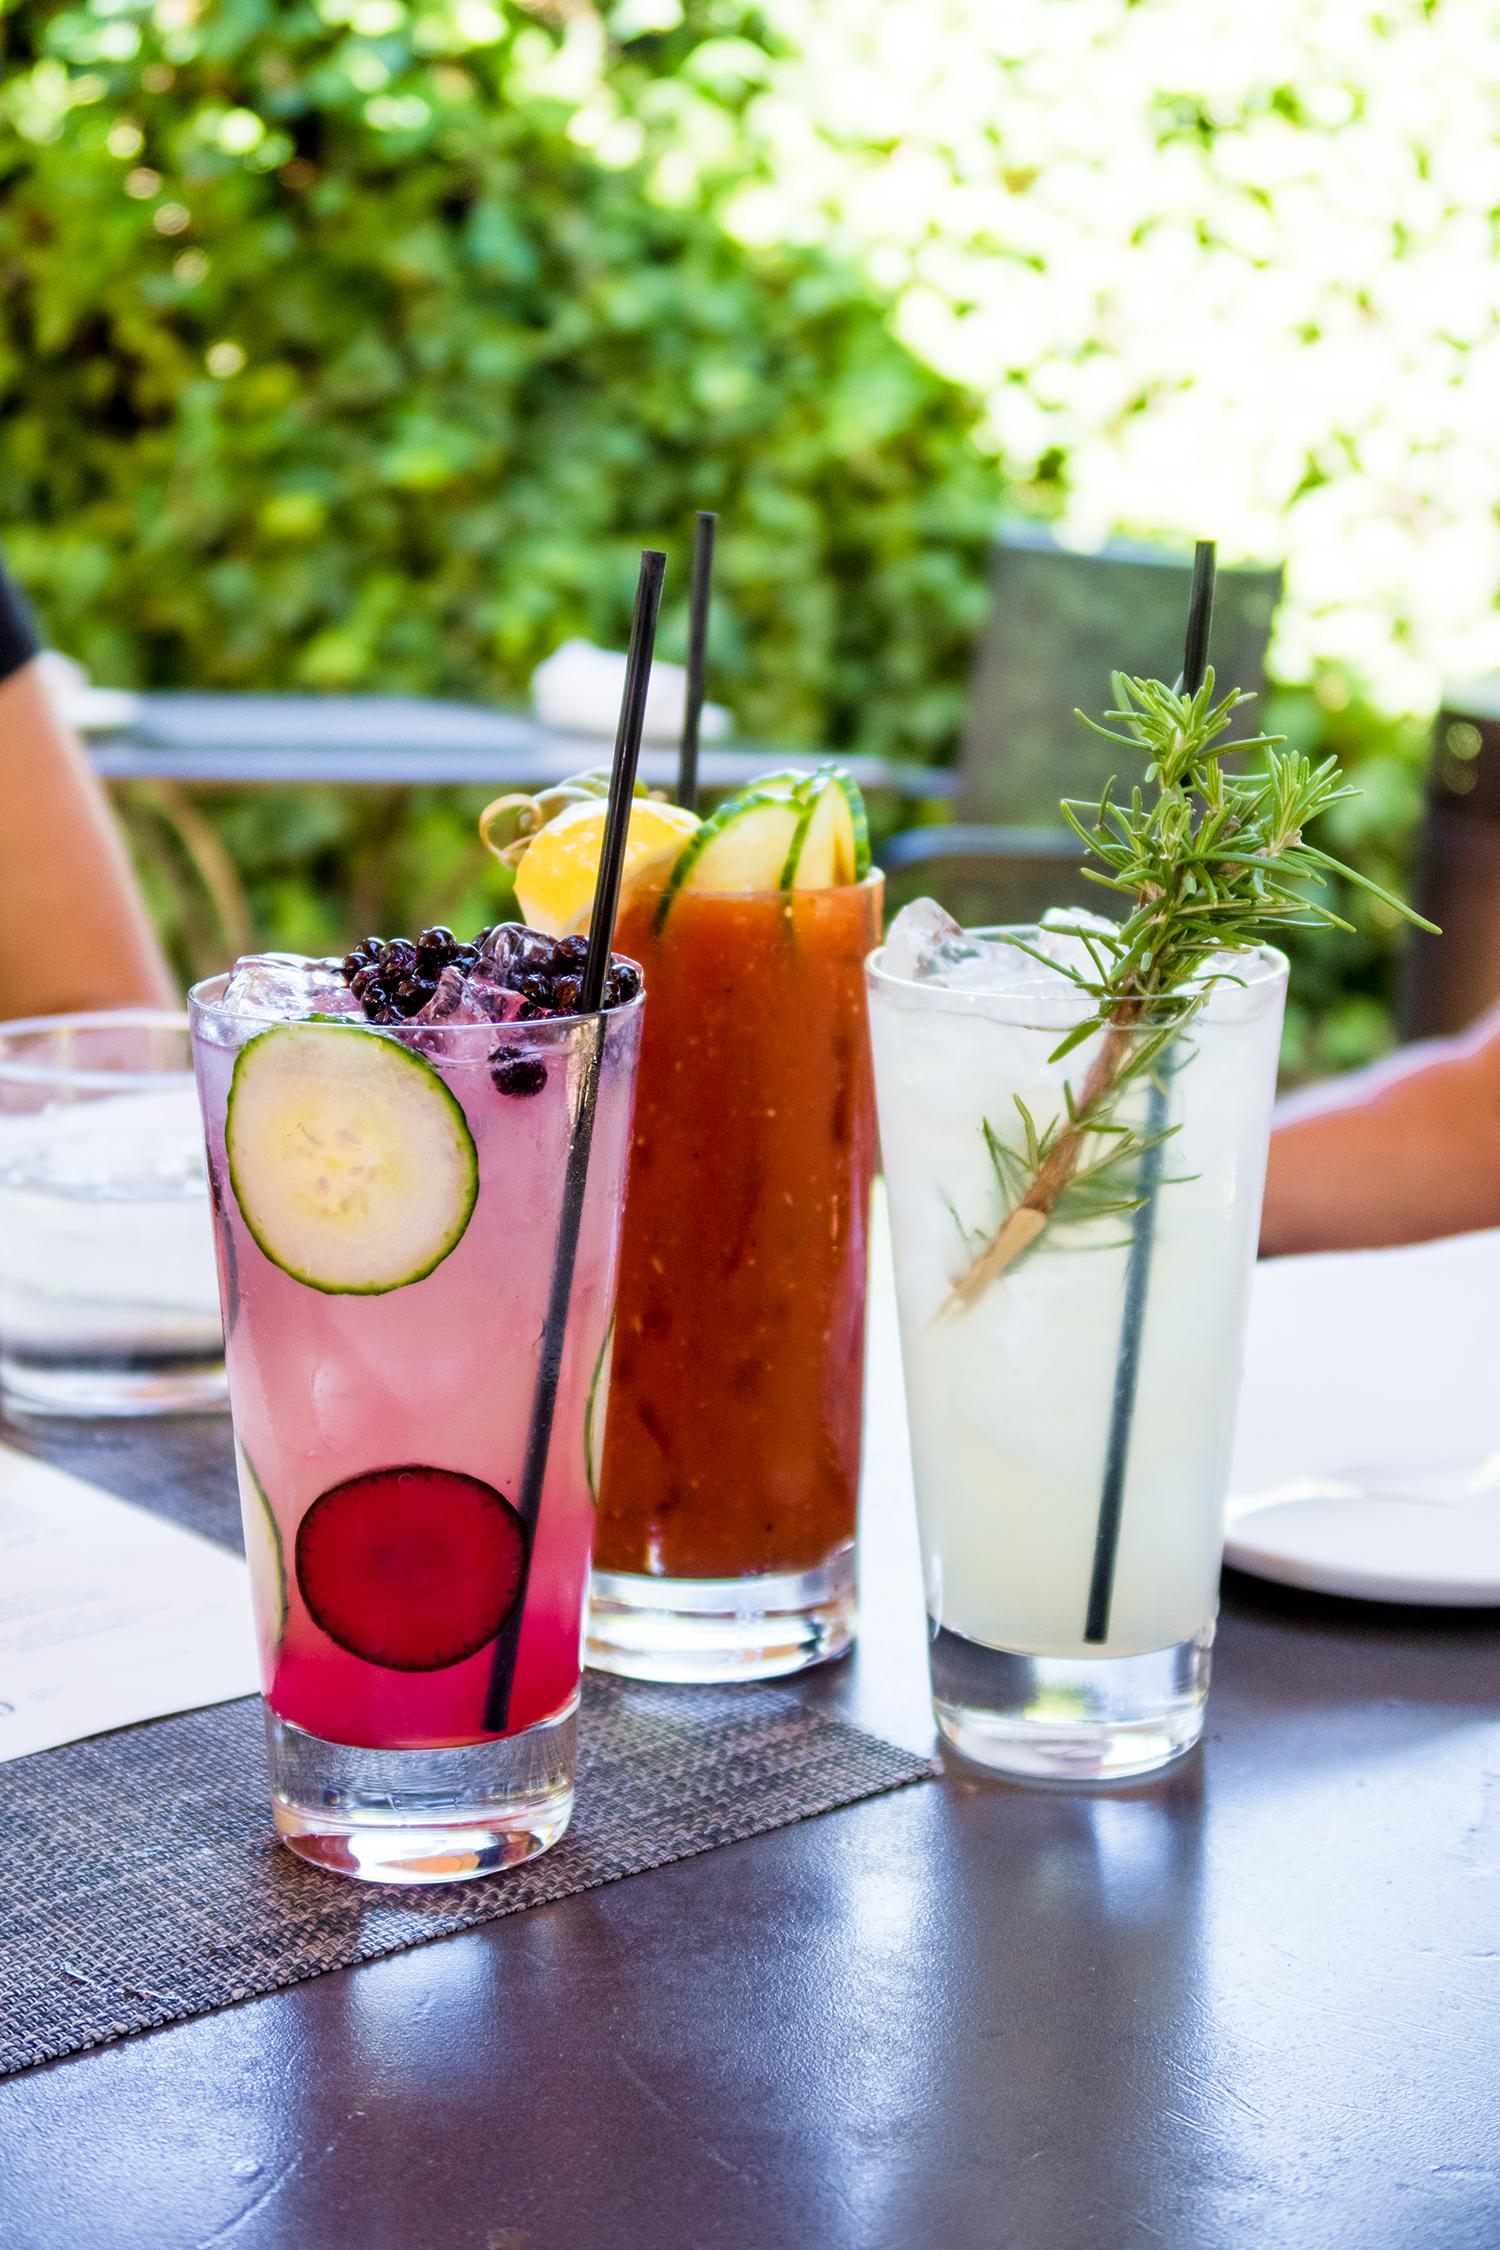 goose gander cocktails jmeyering creative - J.Meyering Creative